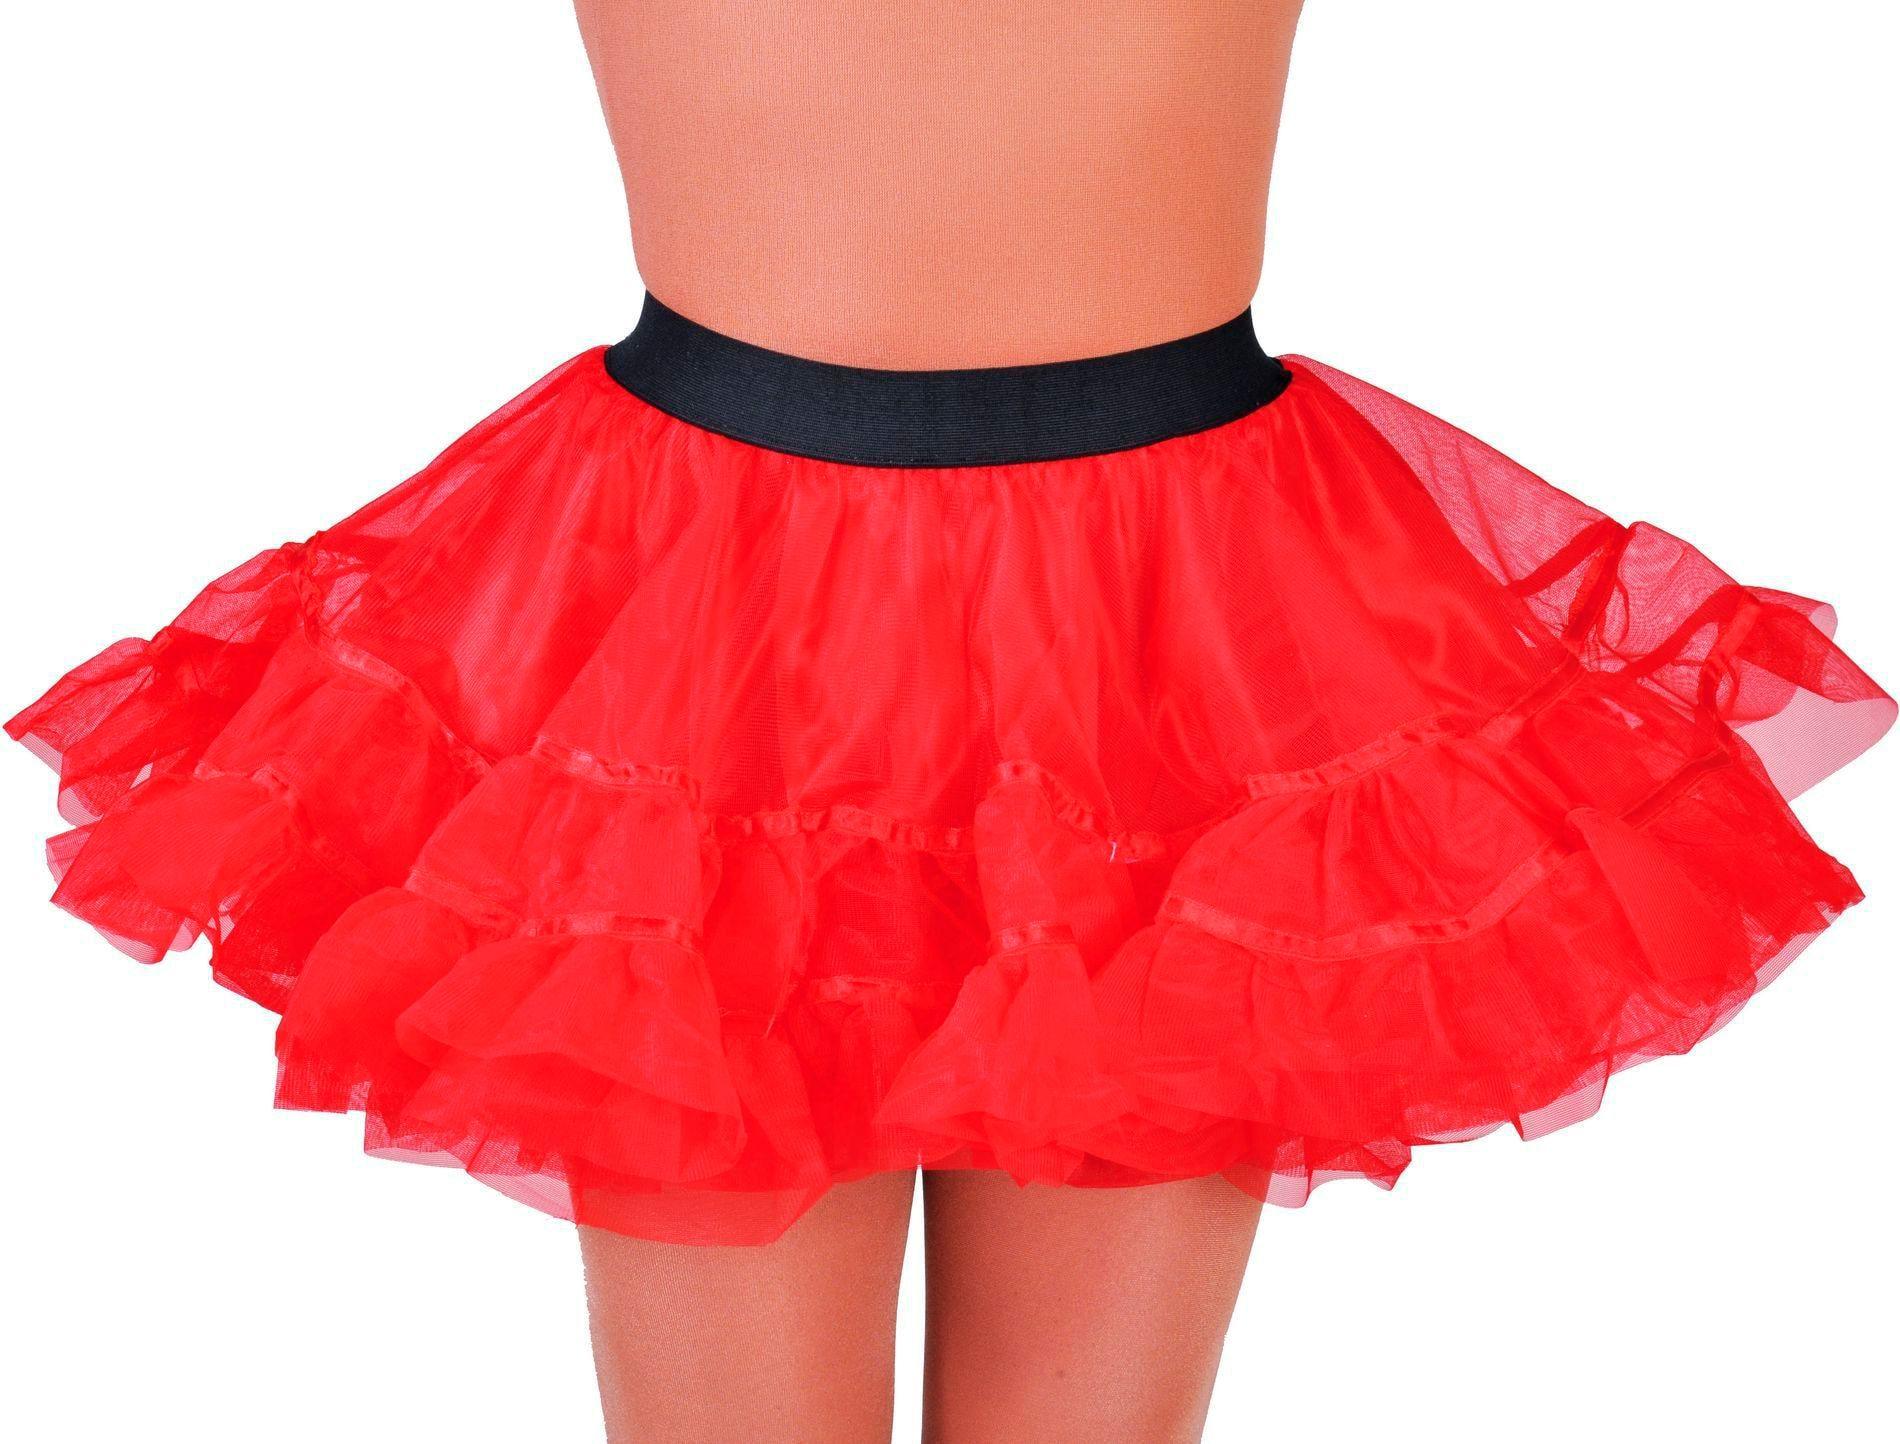 Petticoat rood dames